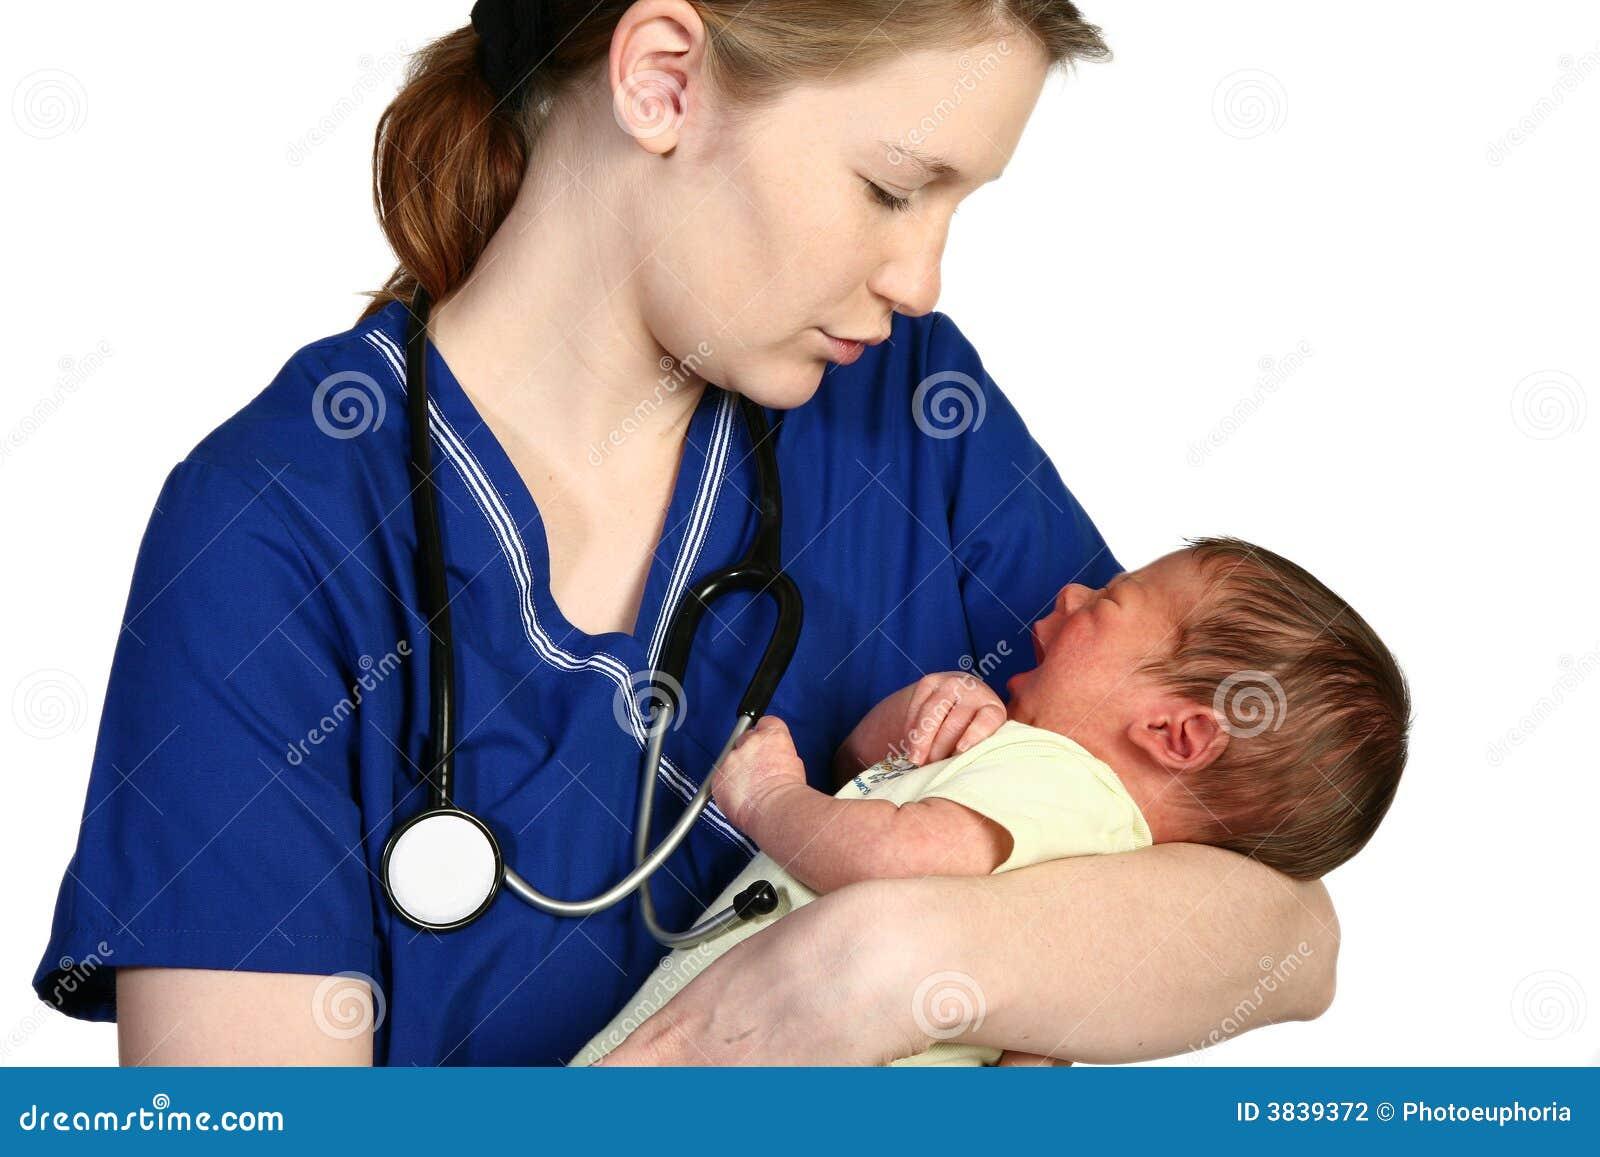 Baby Crying Stock Photography - Image: 3839372